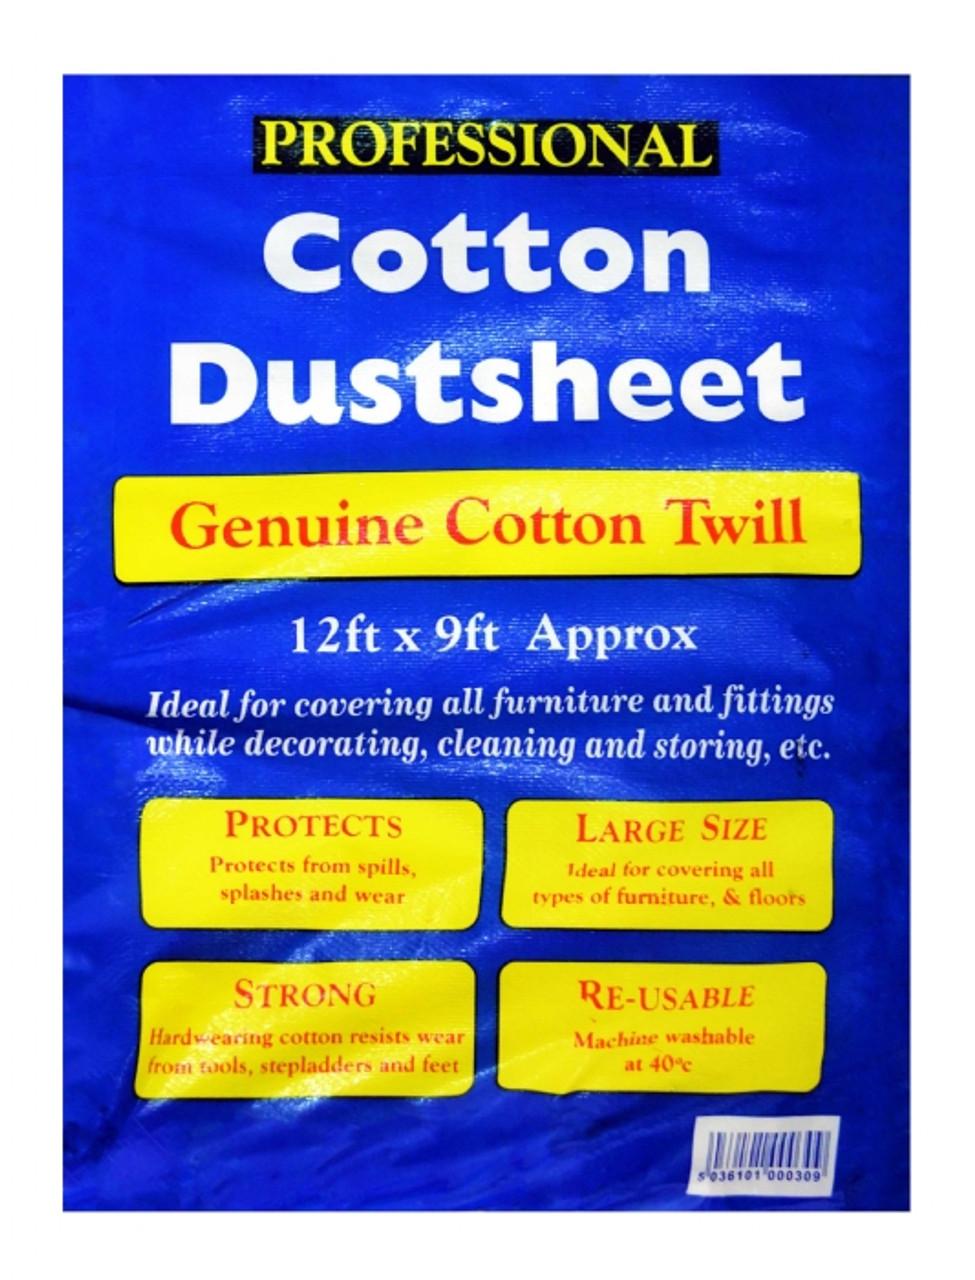 Tristar Cotton Dust Sheet 12x9ft